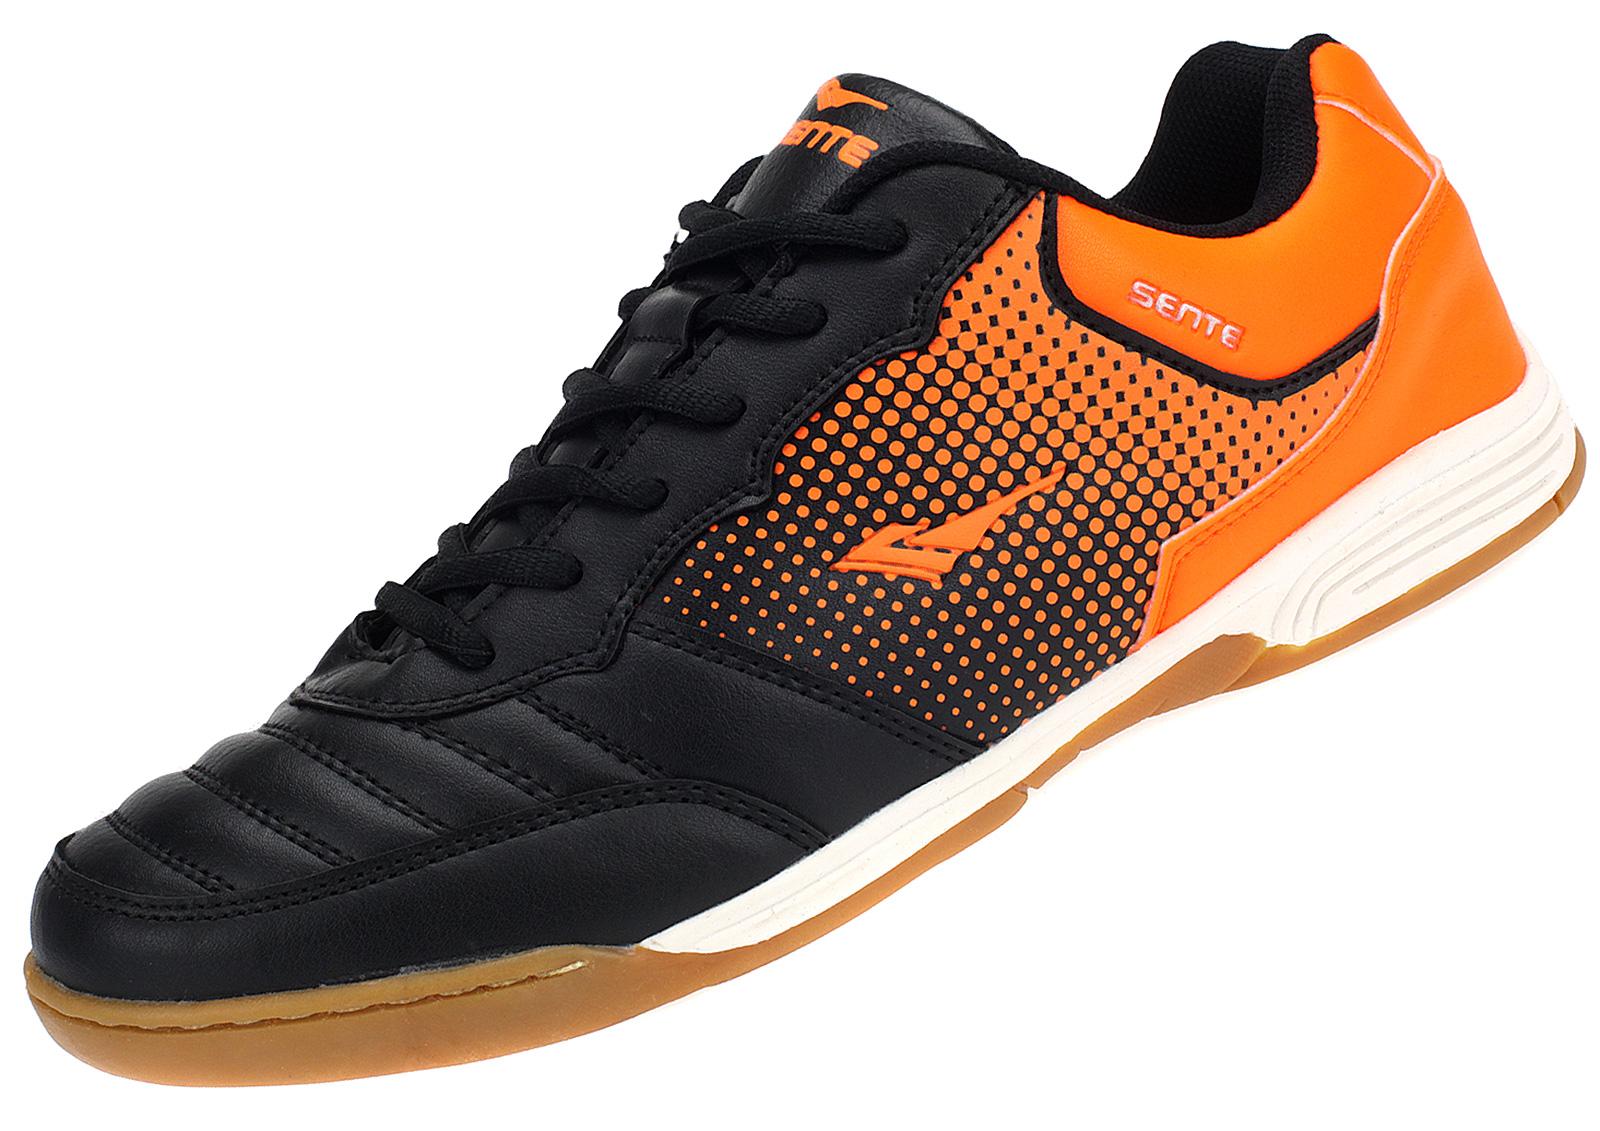 Sneaker Hallenschuhe Turnschuhe Indoor Schuhe Sportschuhe Schnürschuhe Laufschuhe Damen Herren Freizeit